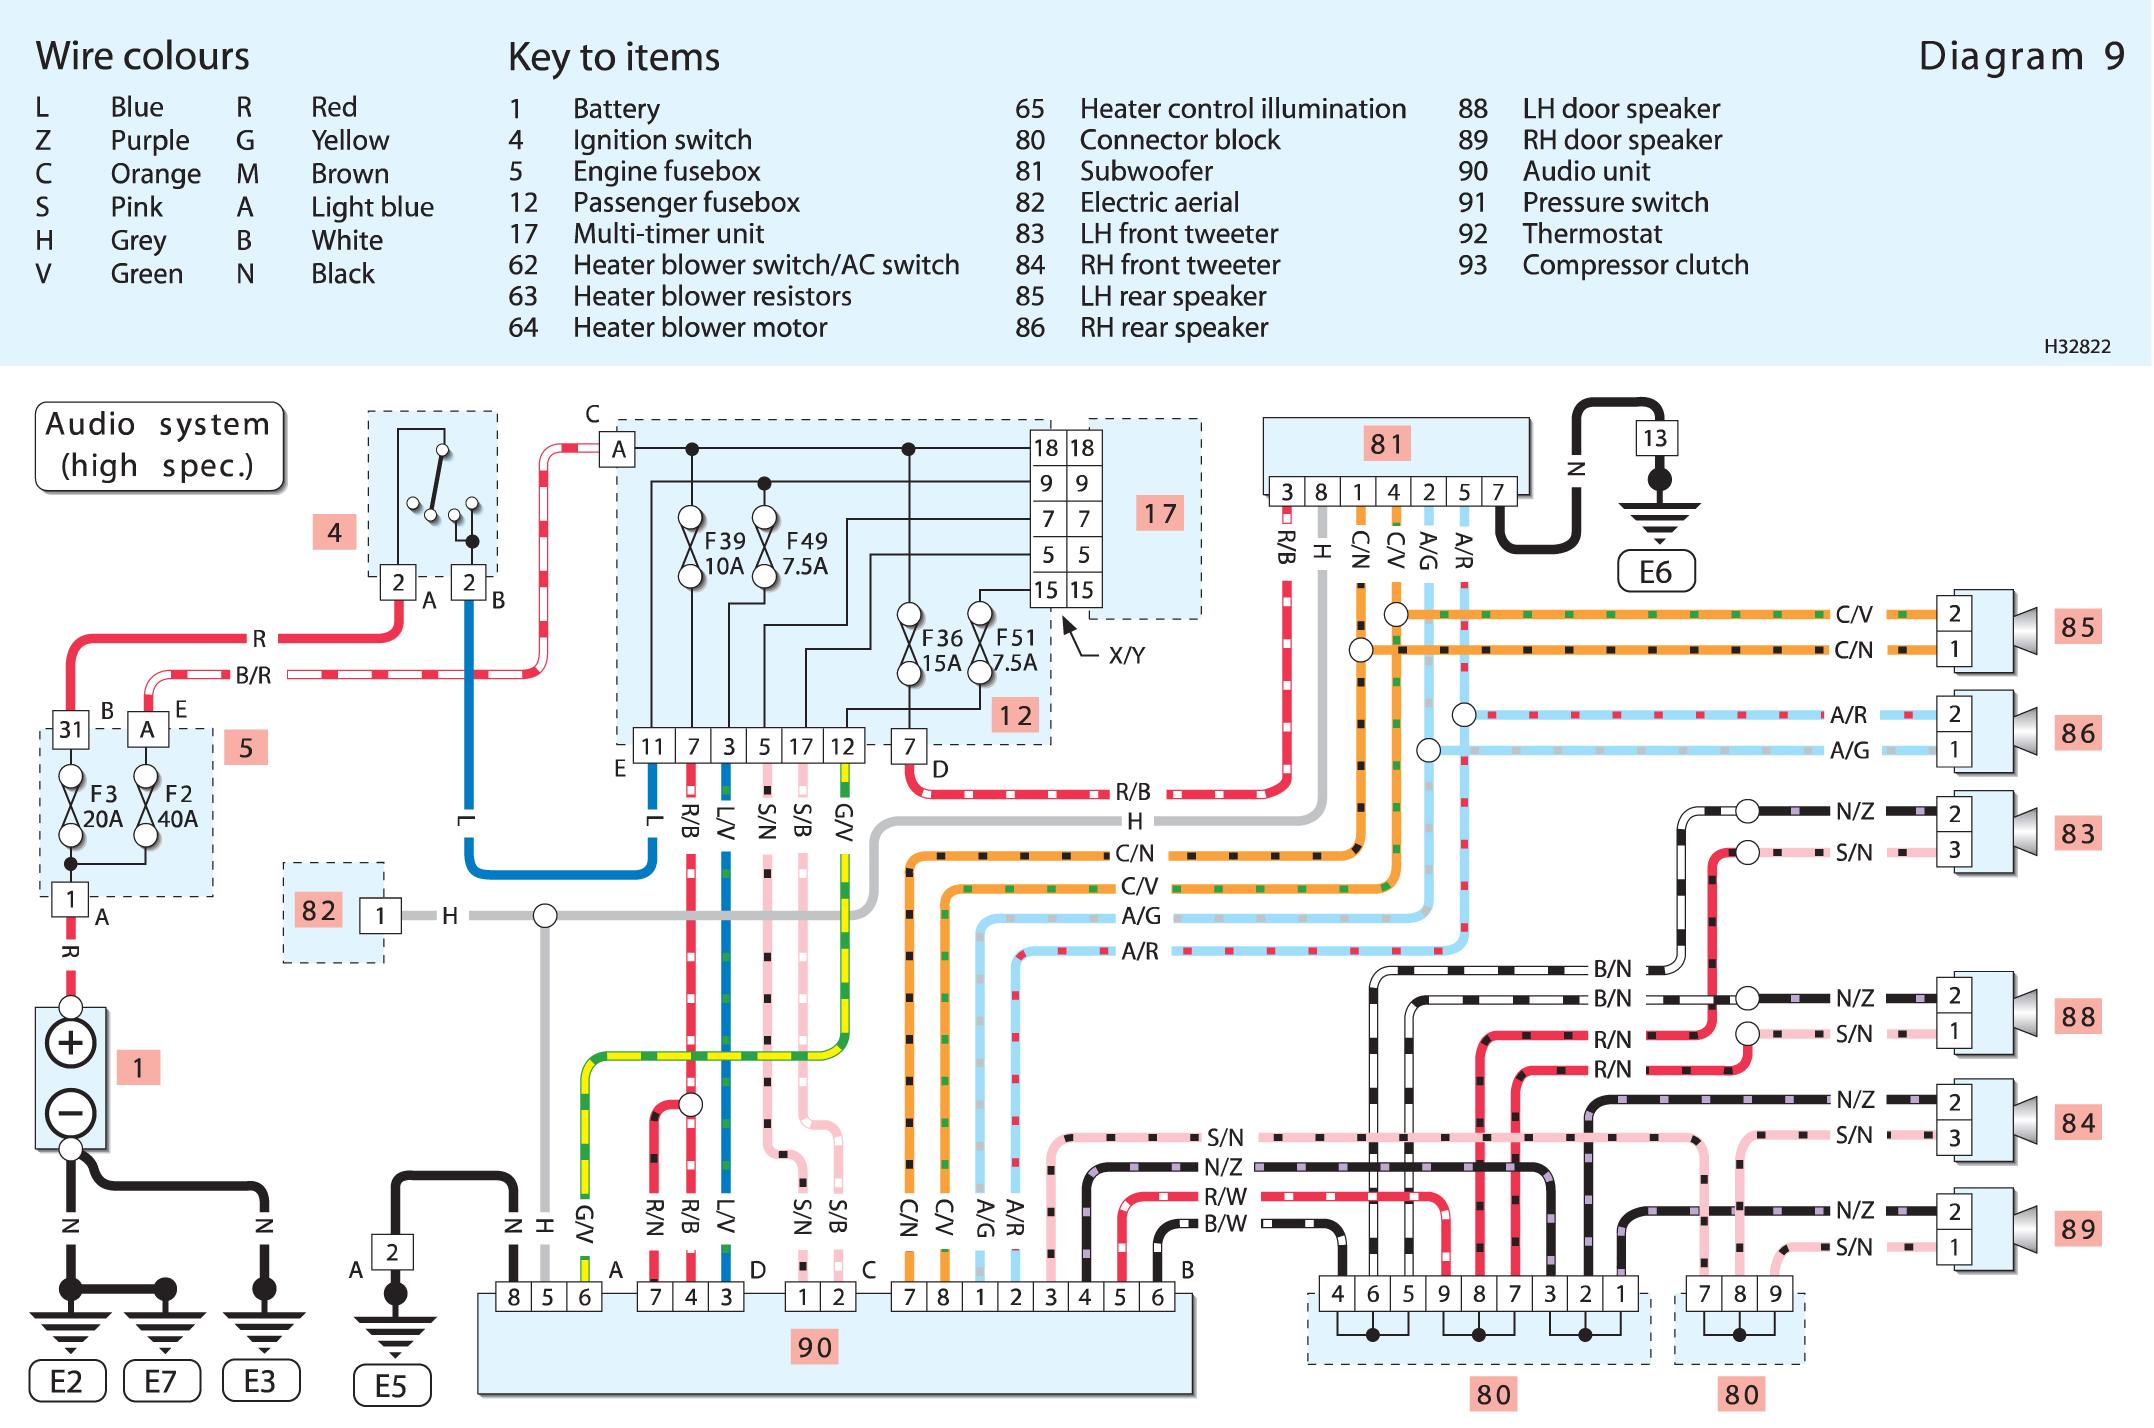 small resolution of fiat uno wiring diagram electrical wiring diagrams amphicar wiring diagram fiat stilo wiring diagrams